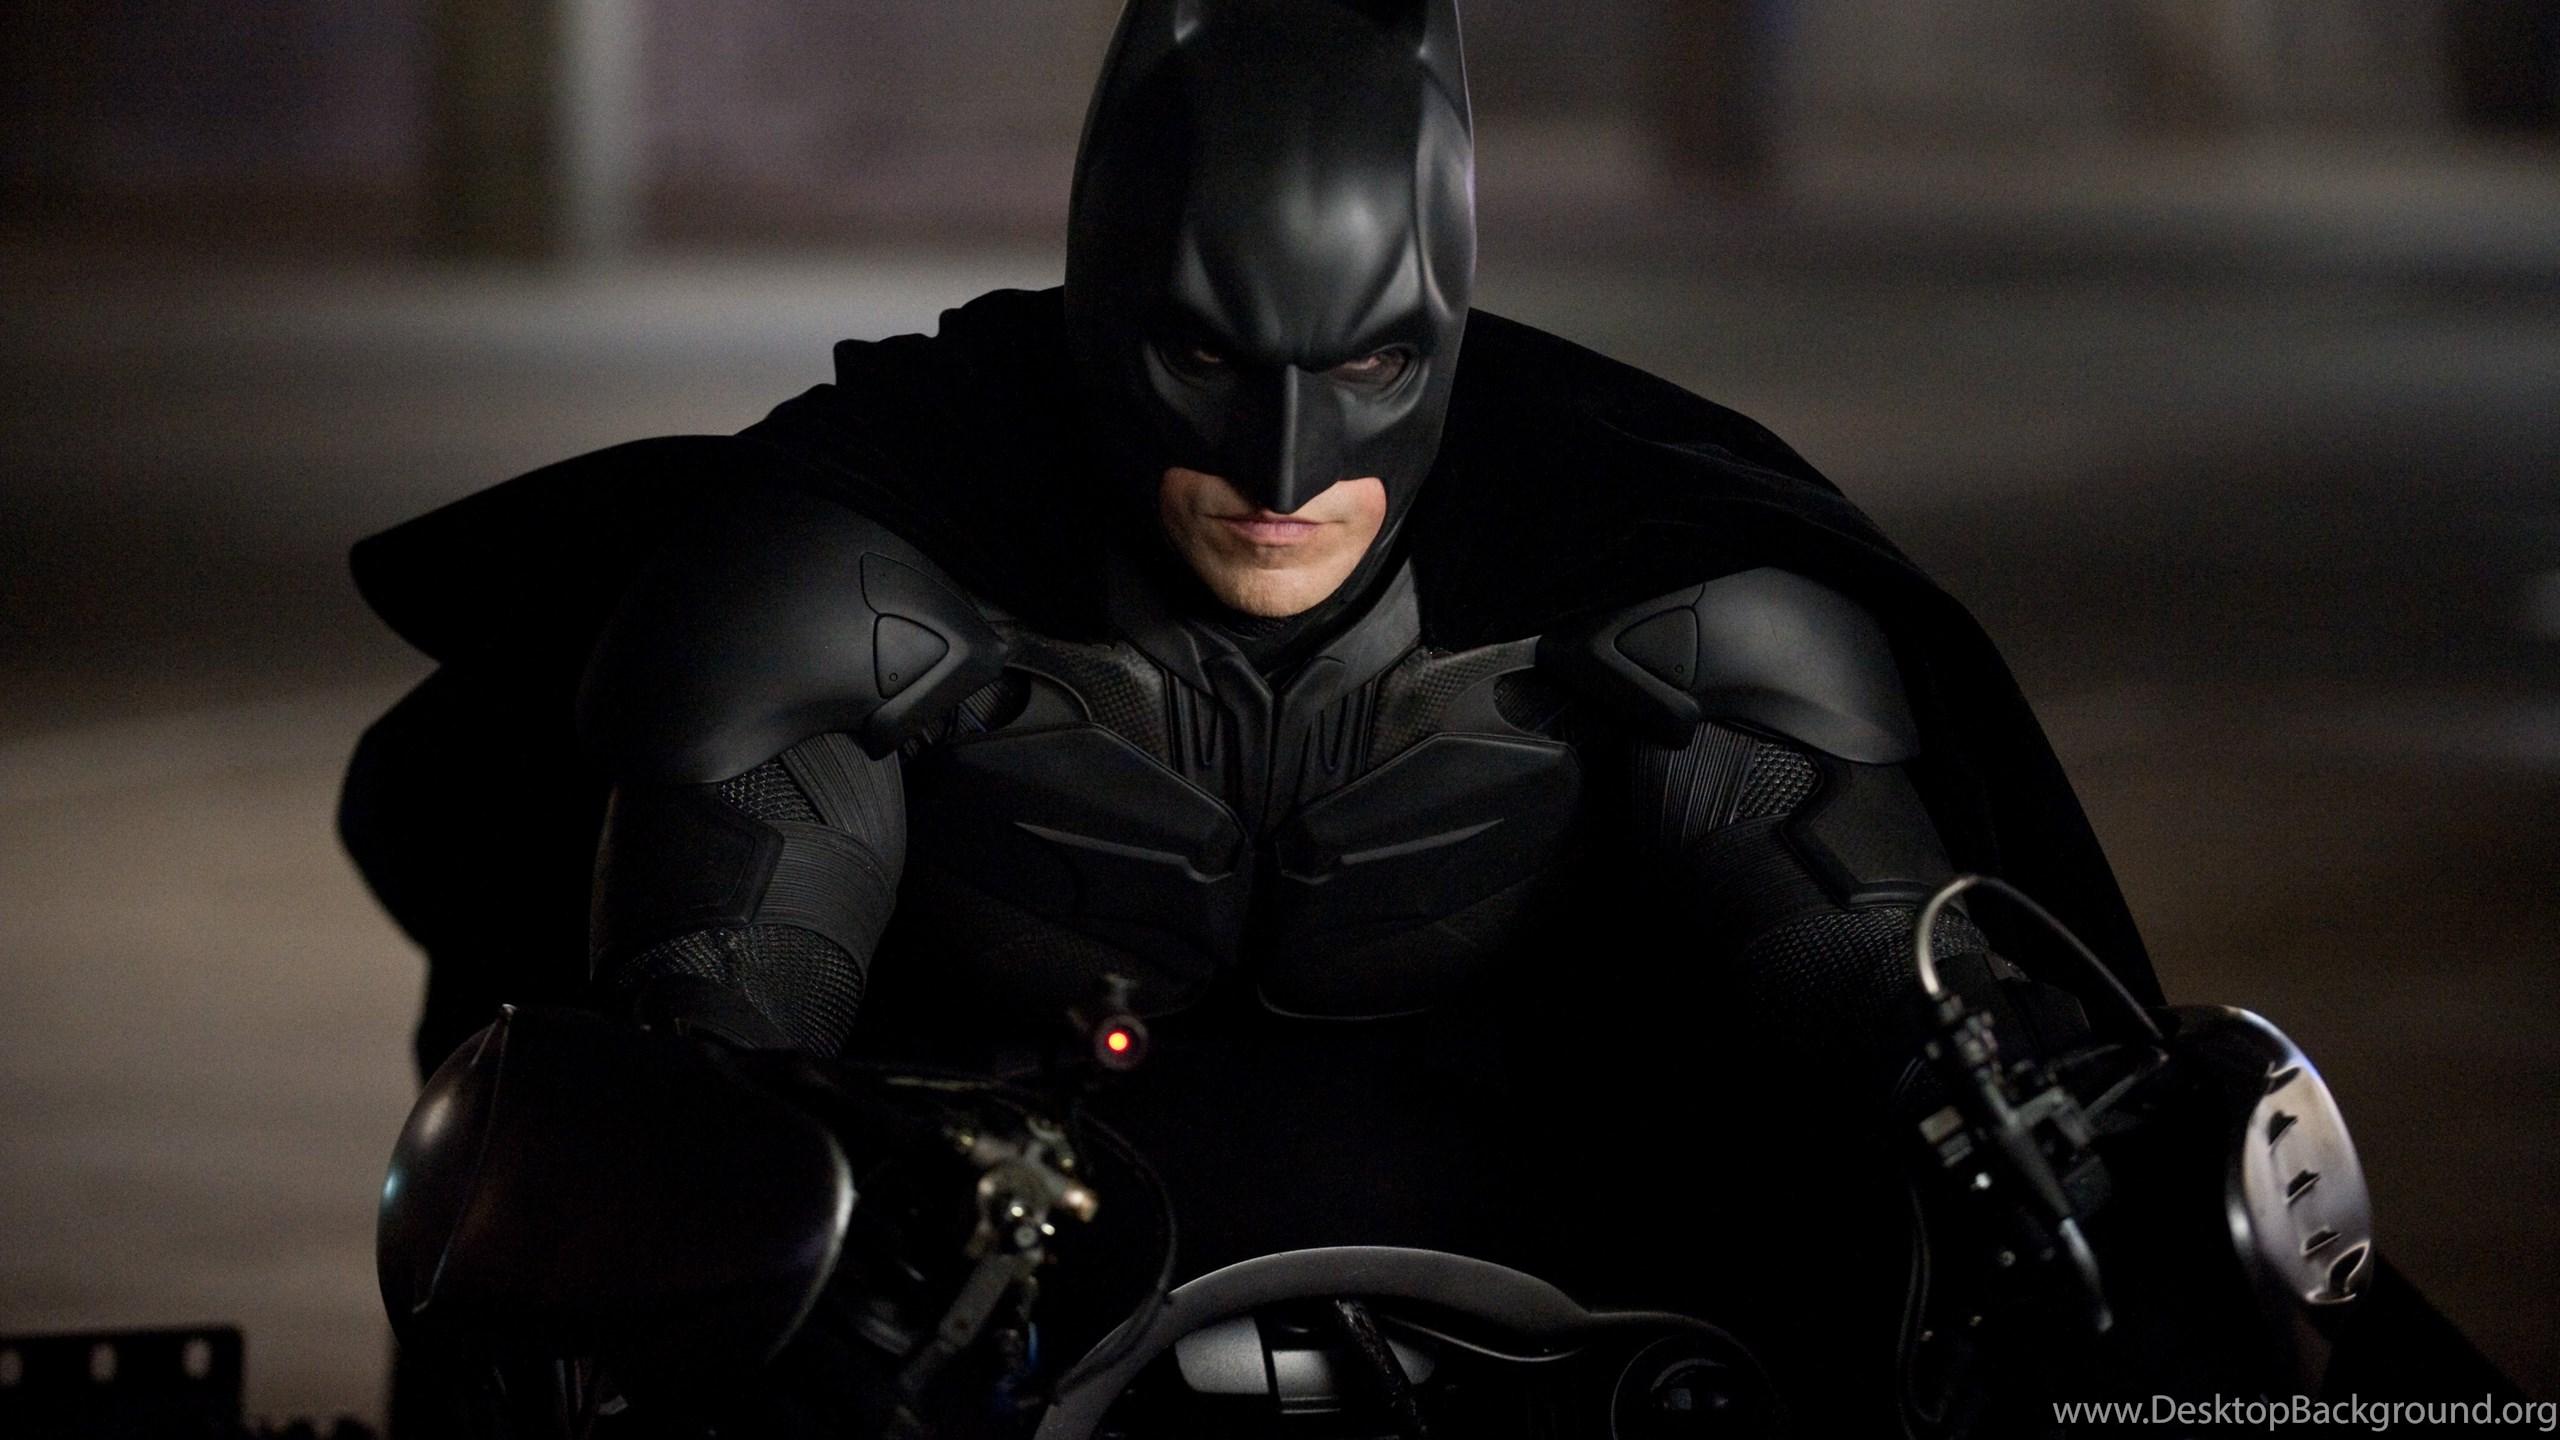 the dark knight rises hd wallpapers free download batman  desktop